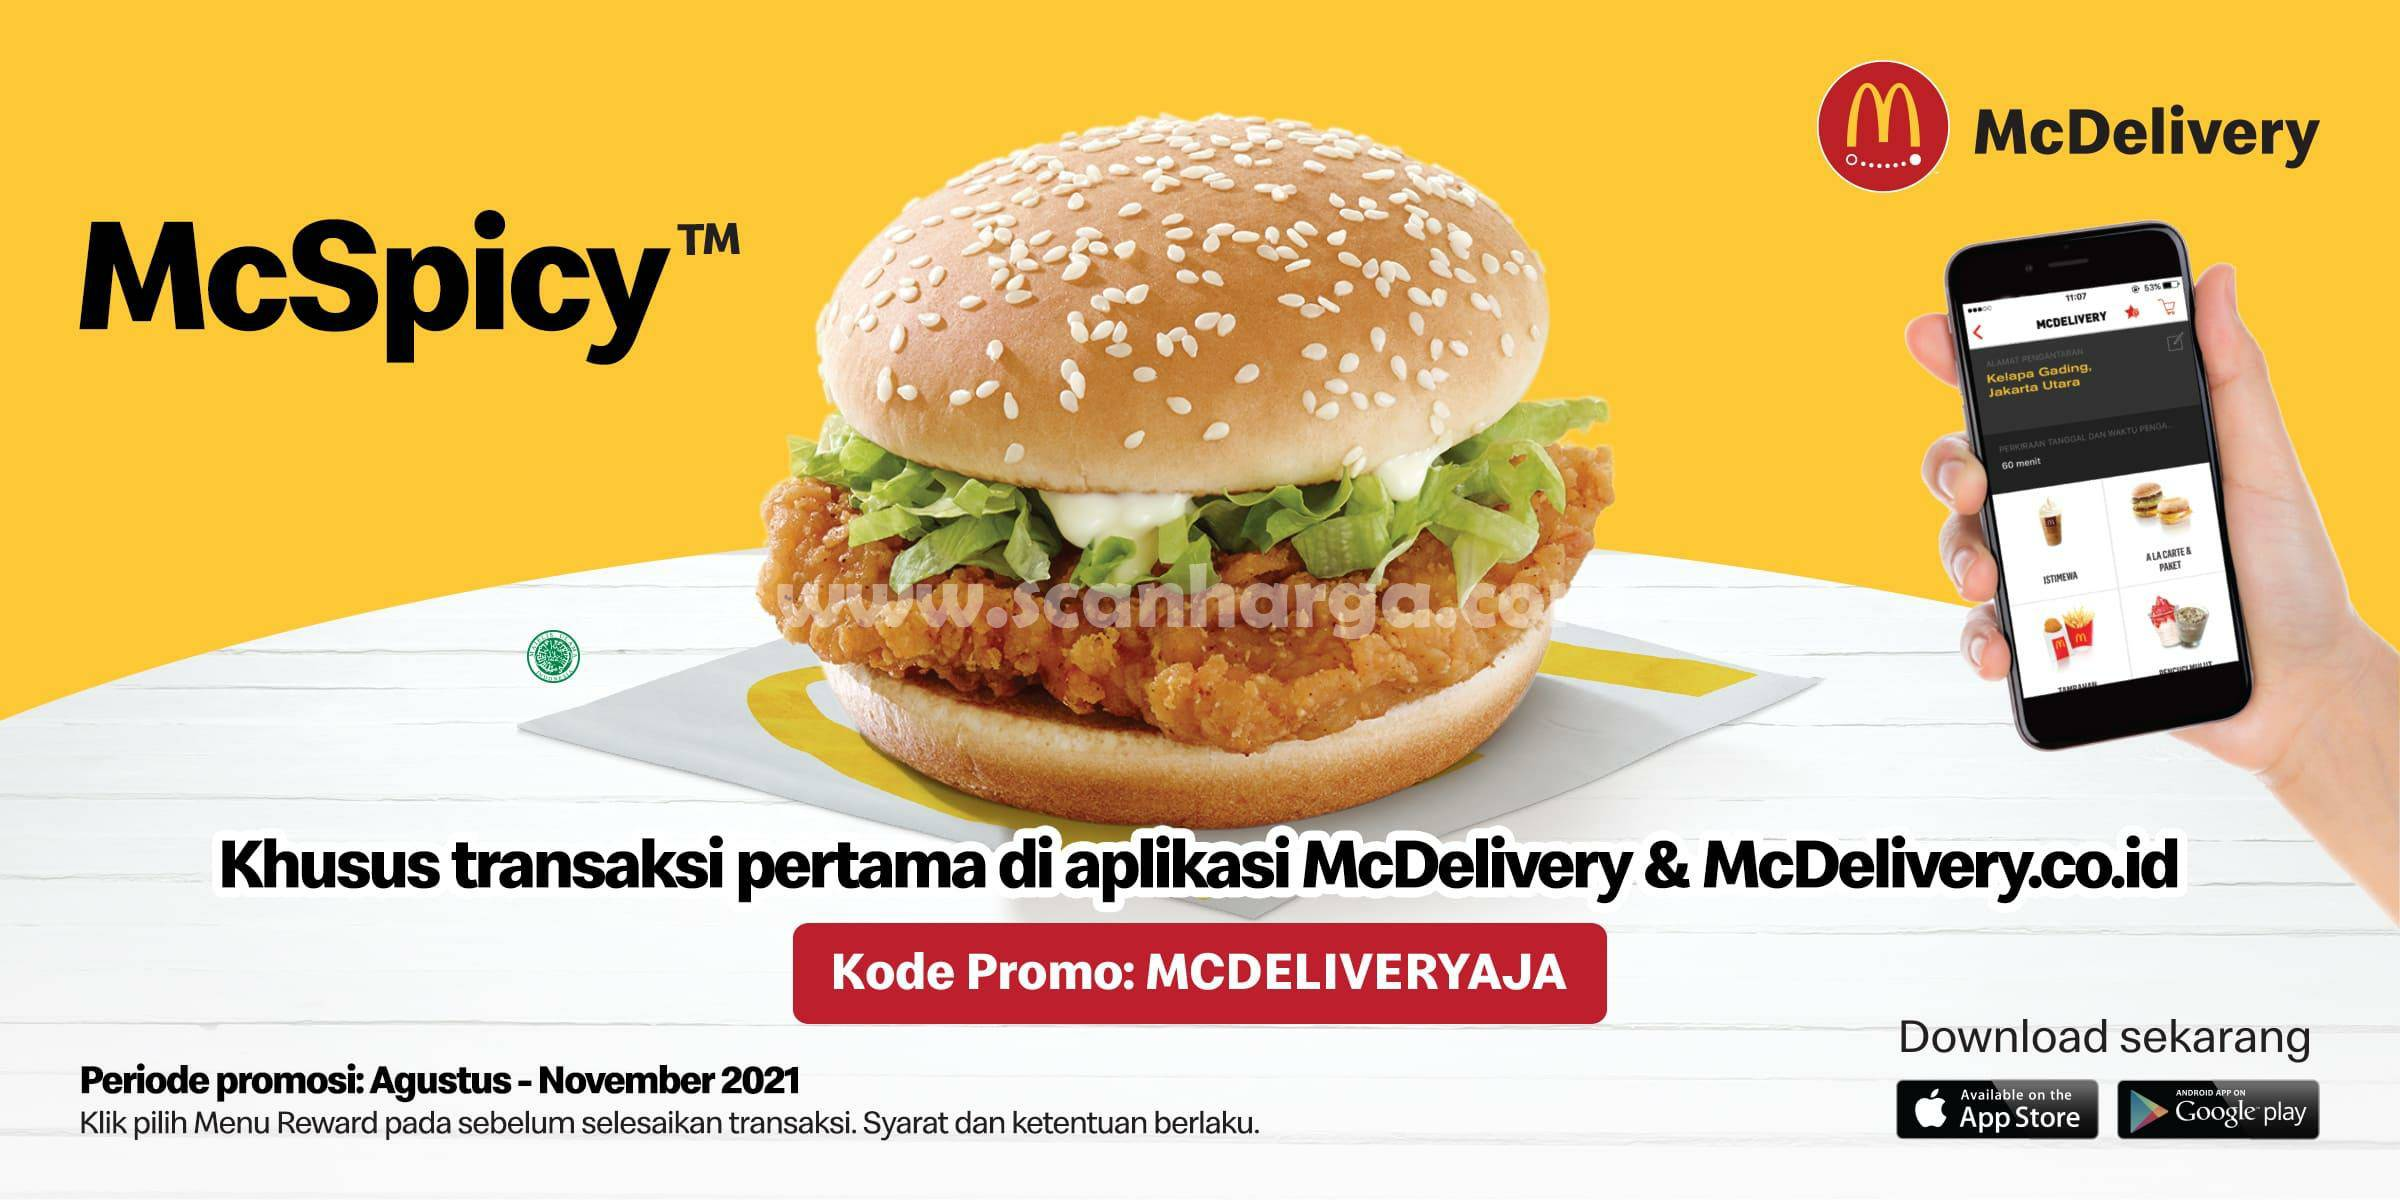 Promo McDonalds McSpicy Hanya Rp. 1,- Aja